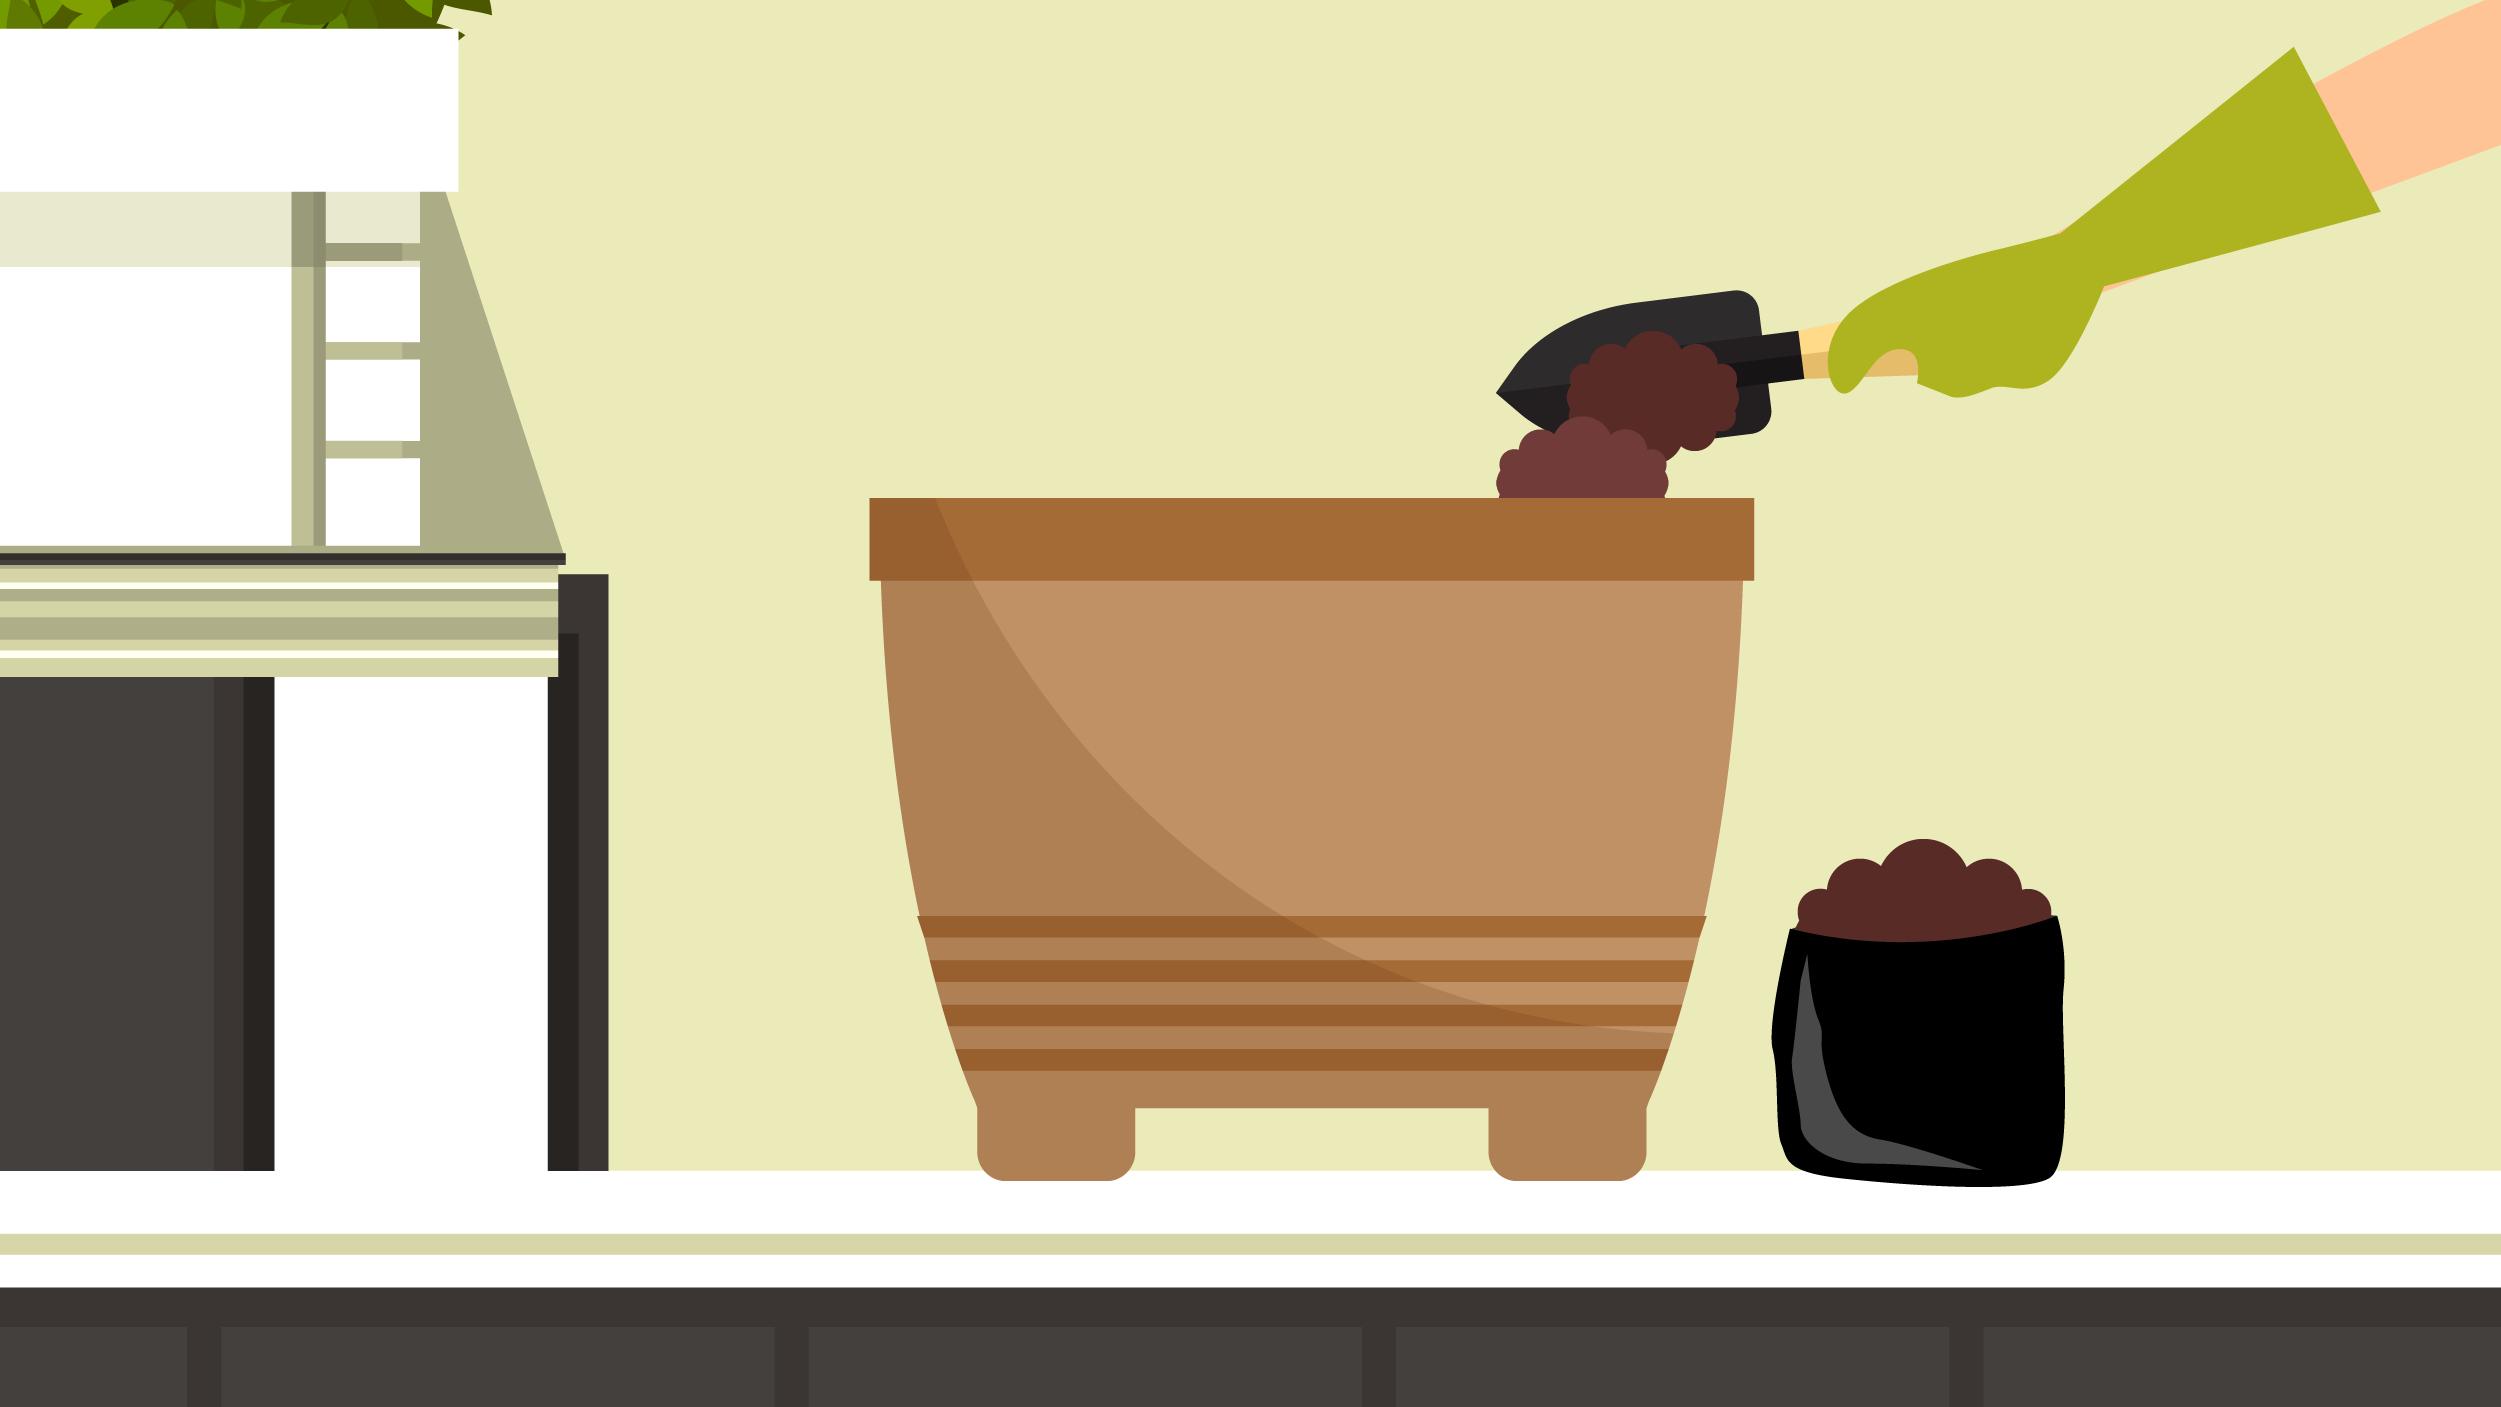 Illustration of a gardener poring Jobe's fertilizer into an empty pot with a gardening shovel.